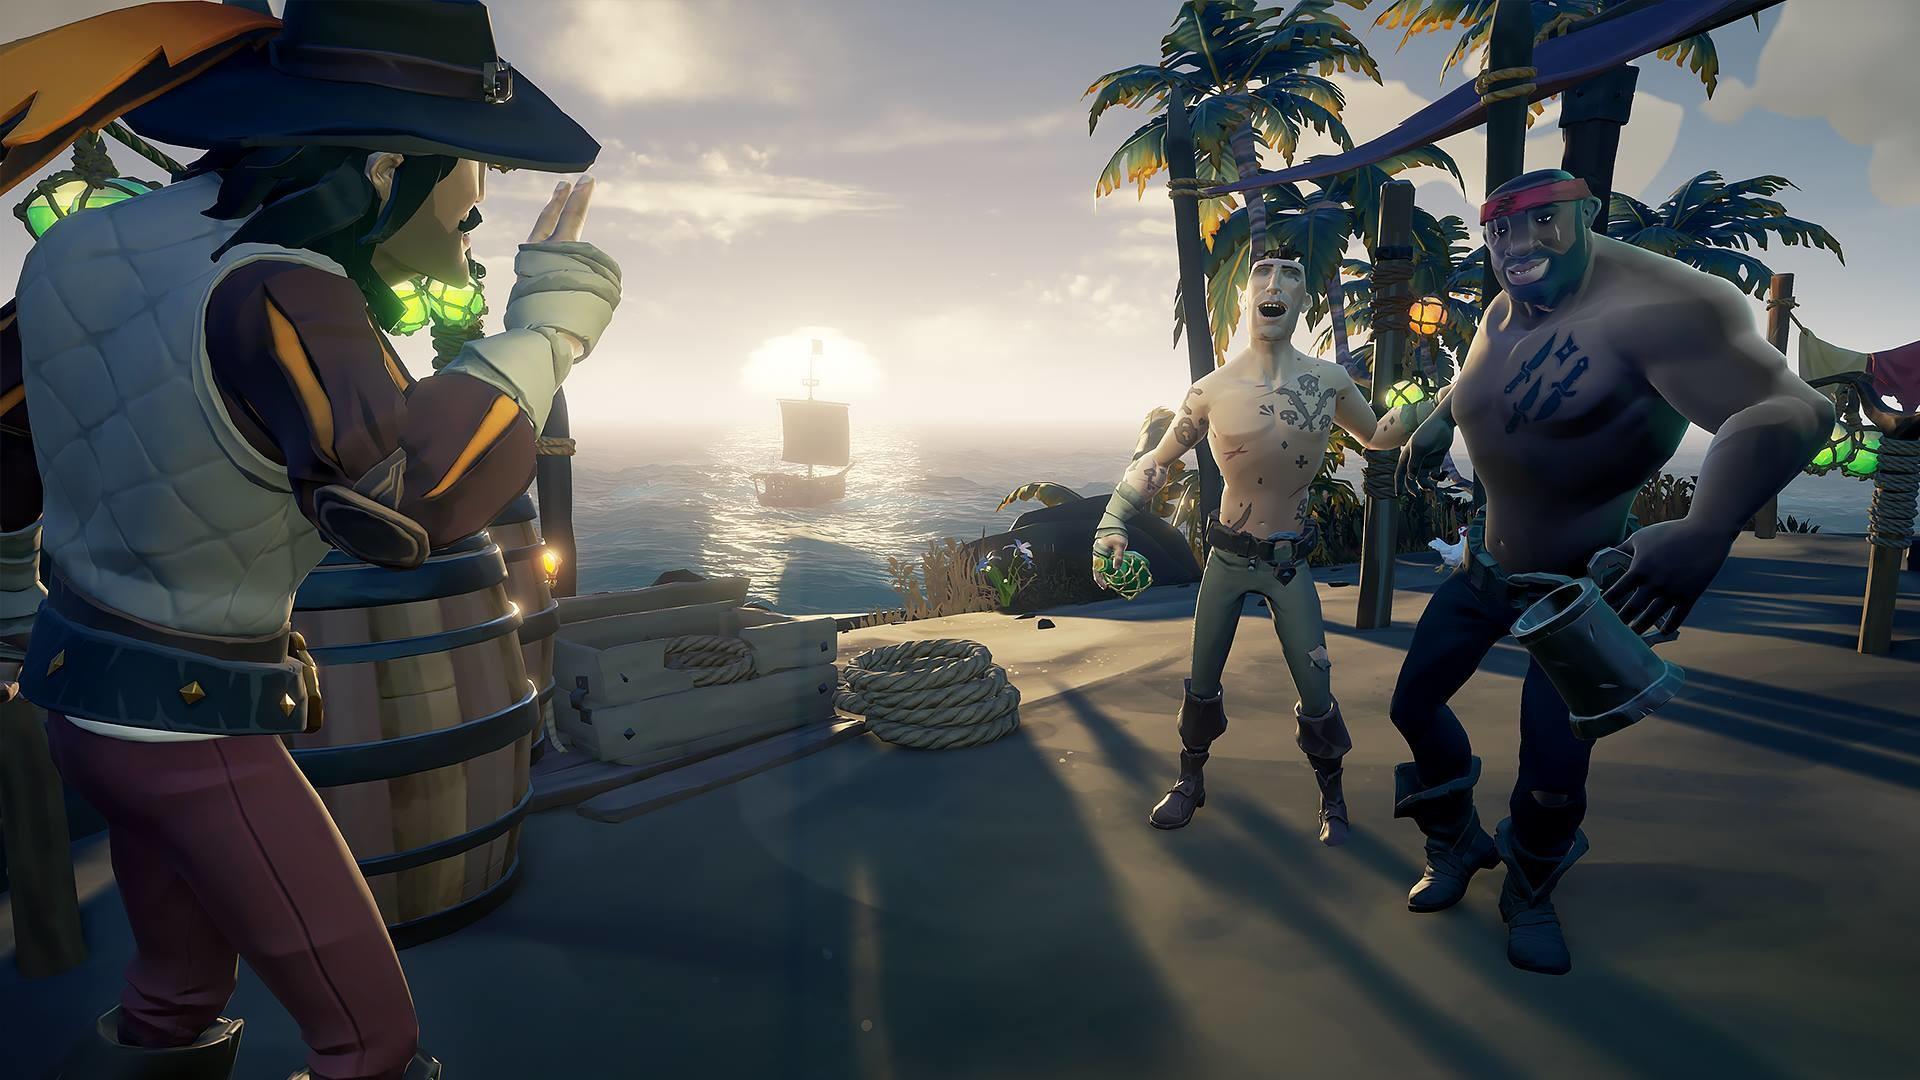 Sea Of Thieves 1 0 7 Update Brings Private Crews Better Higher